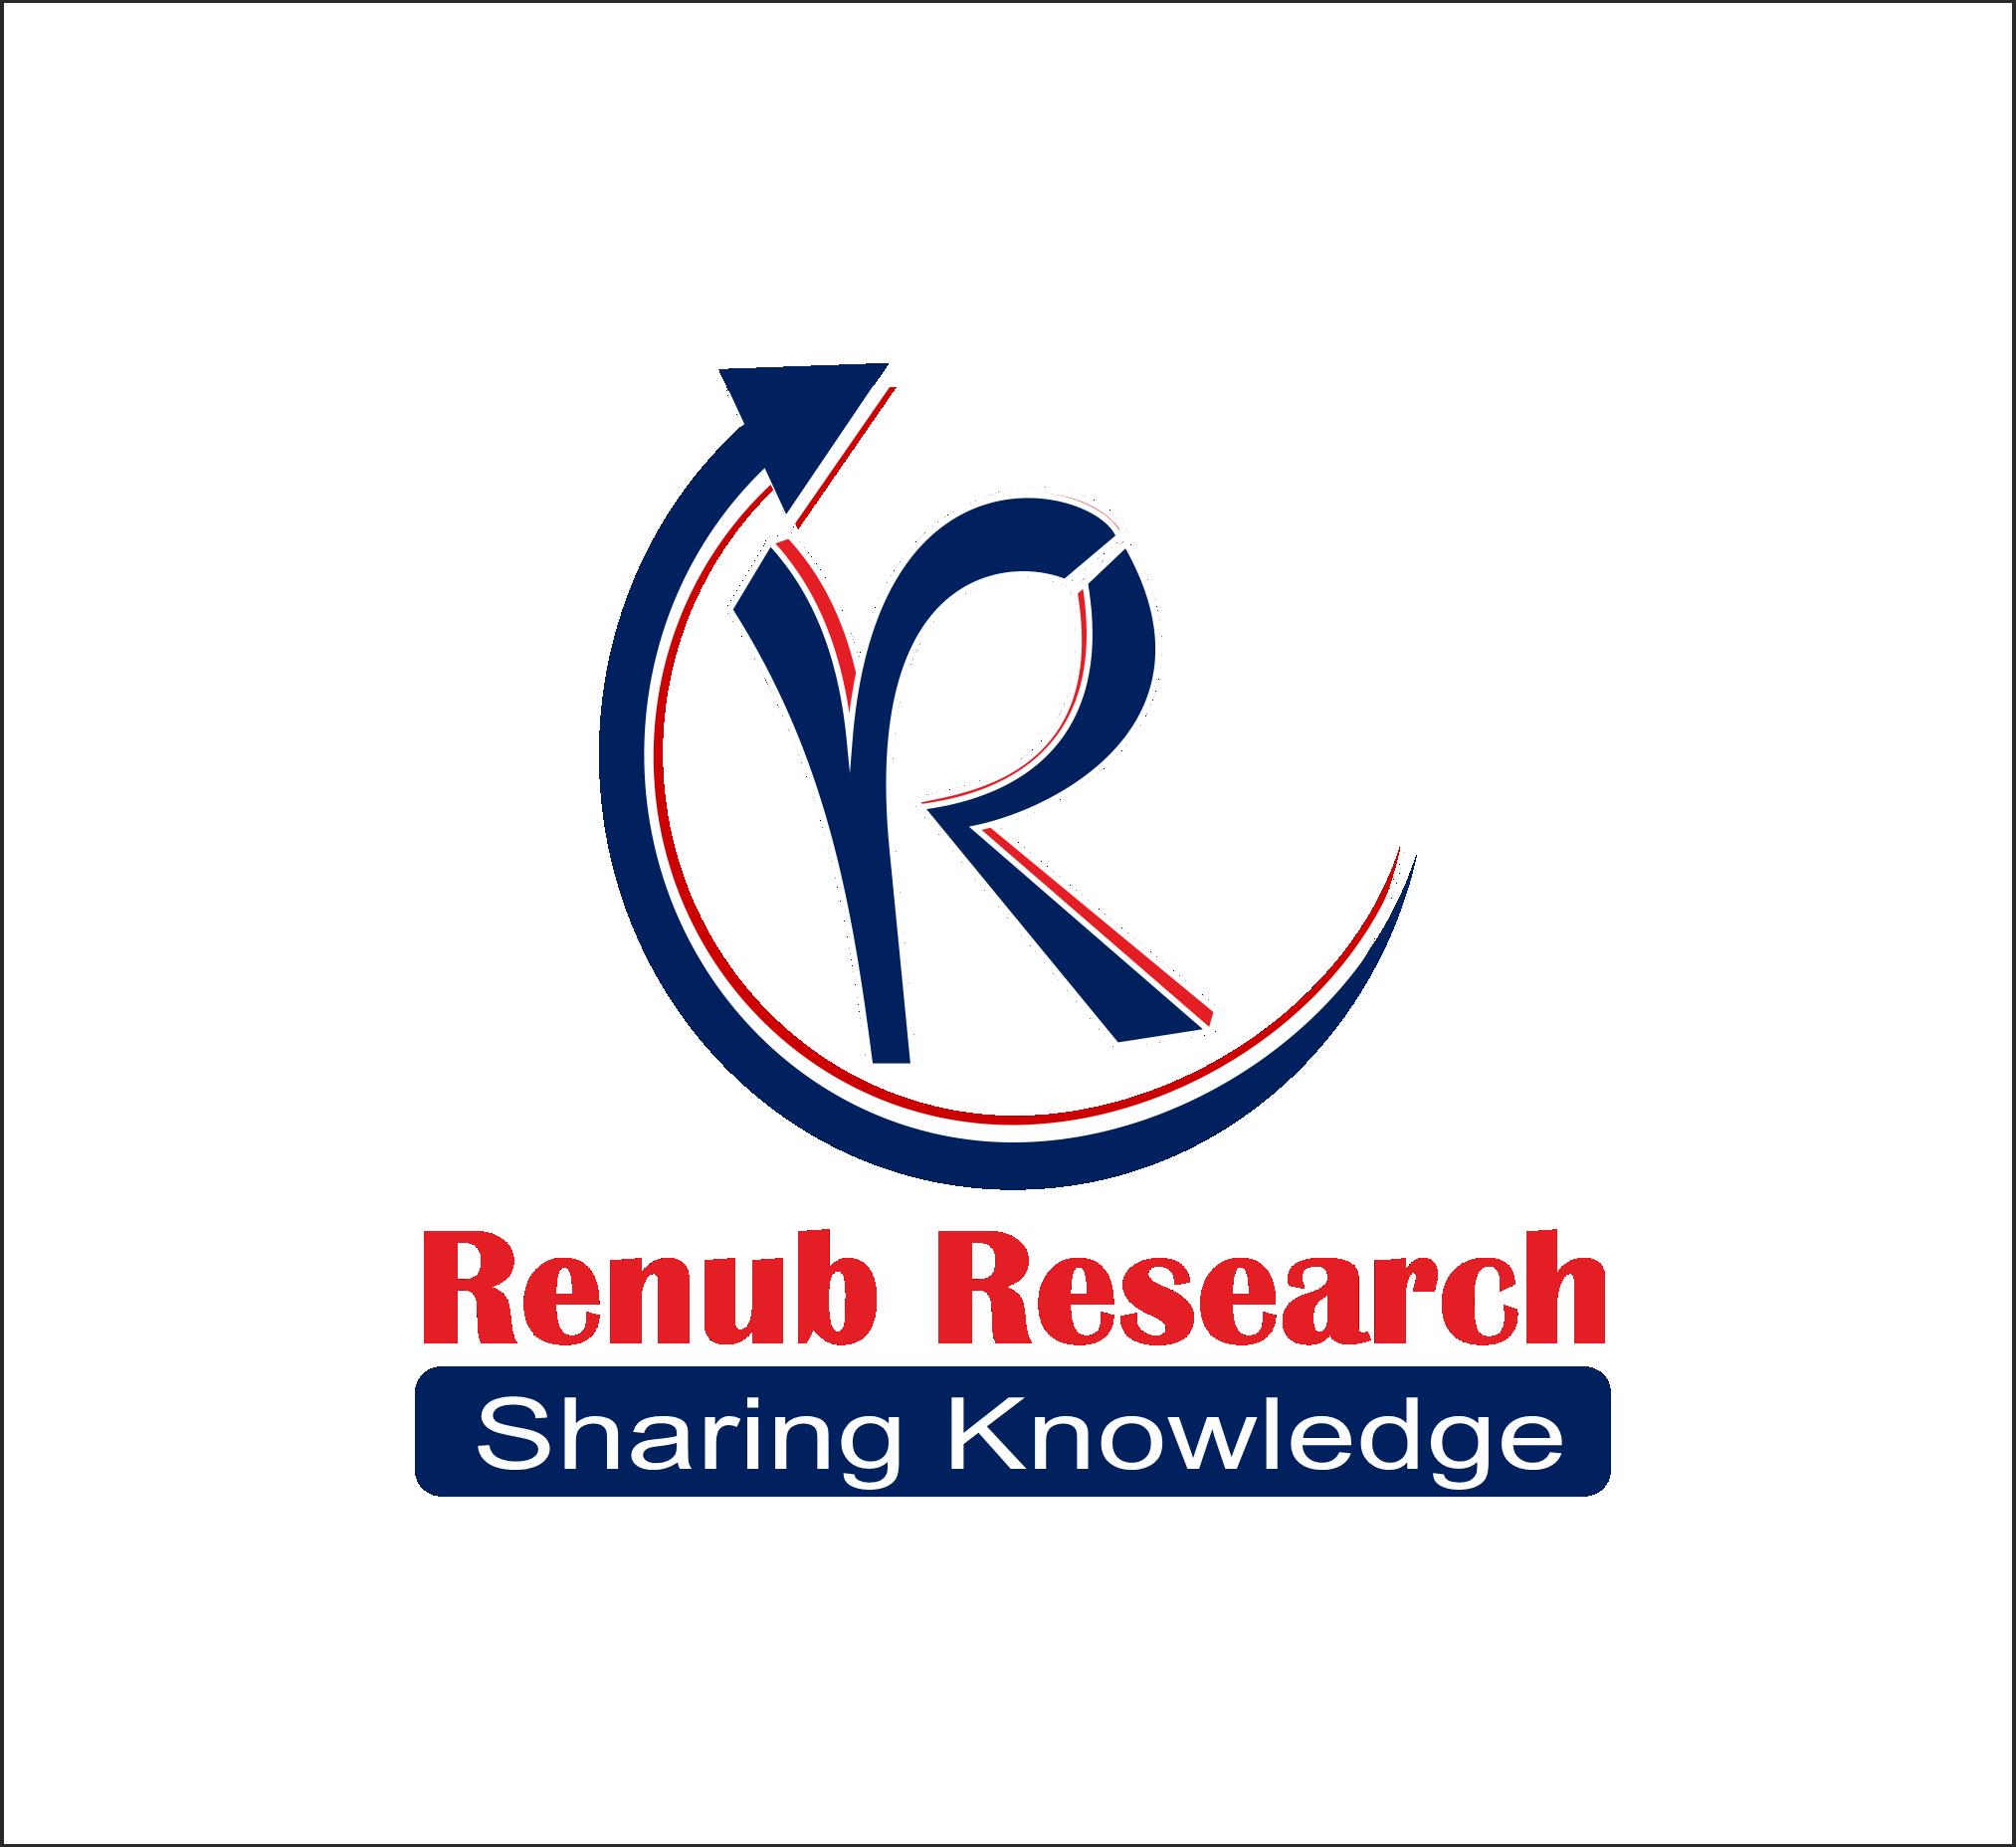 Hepatitis C Drugs Market Global Forecast By Distribution Channels - Renub Research